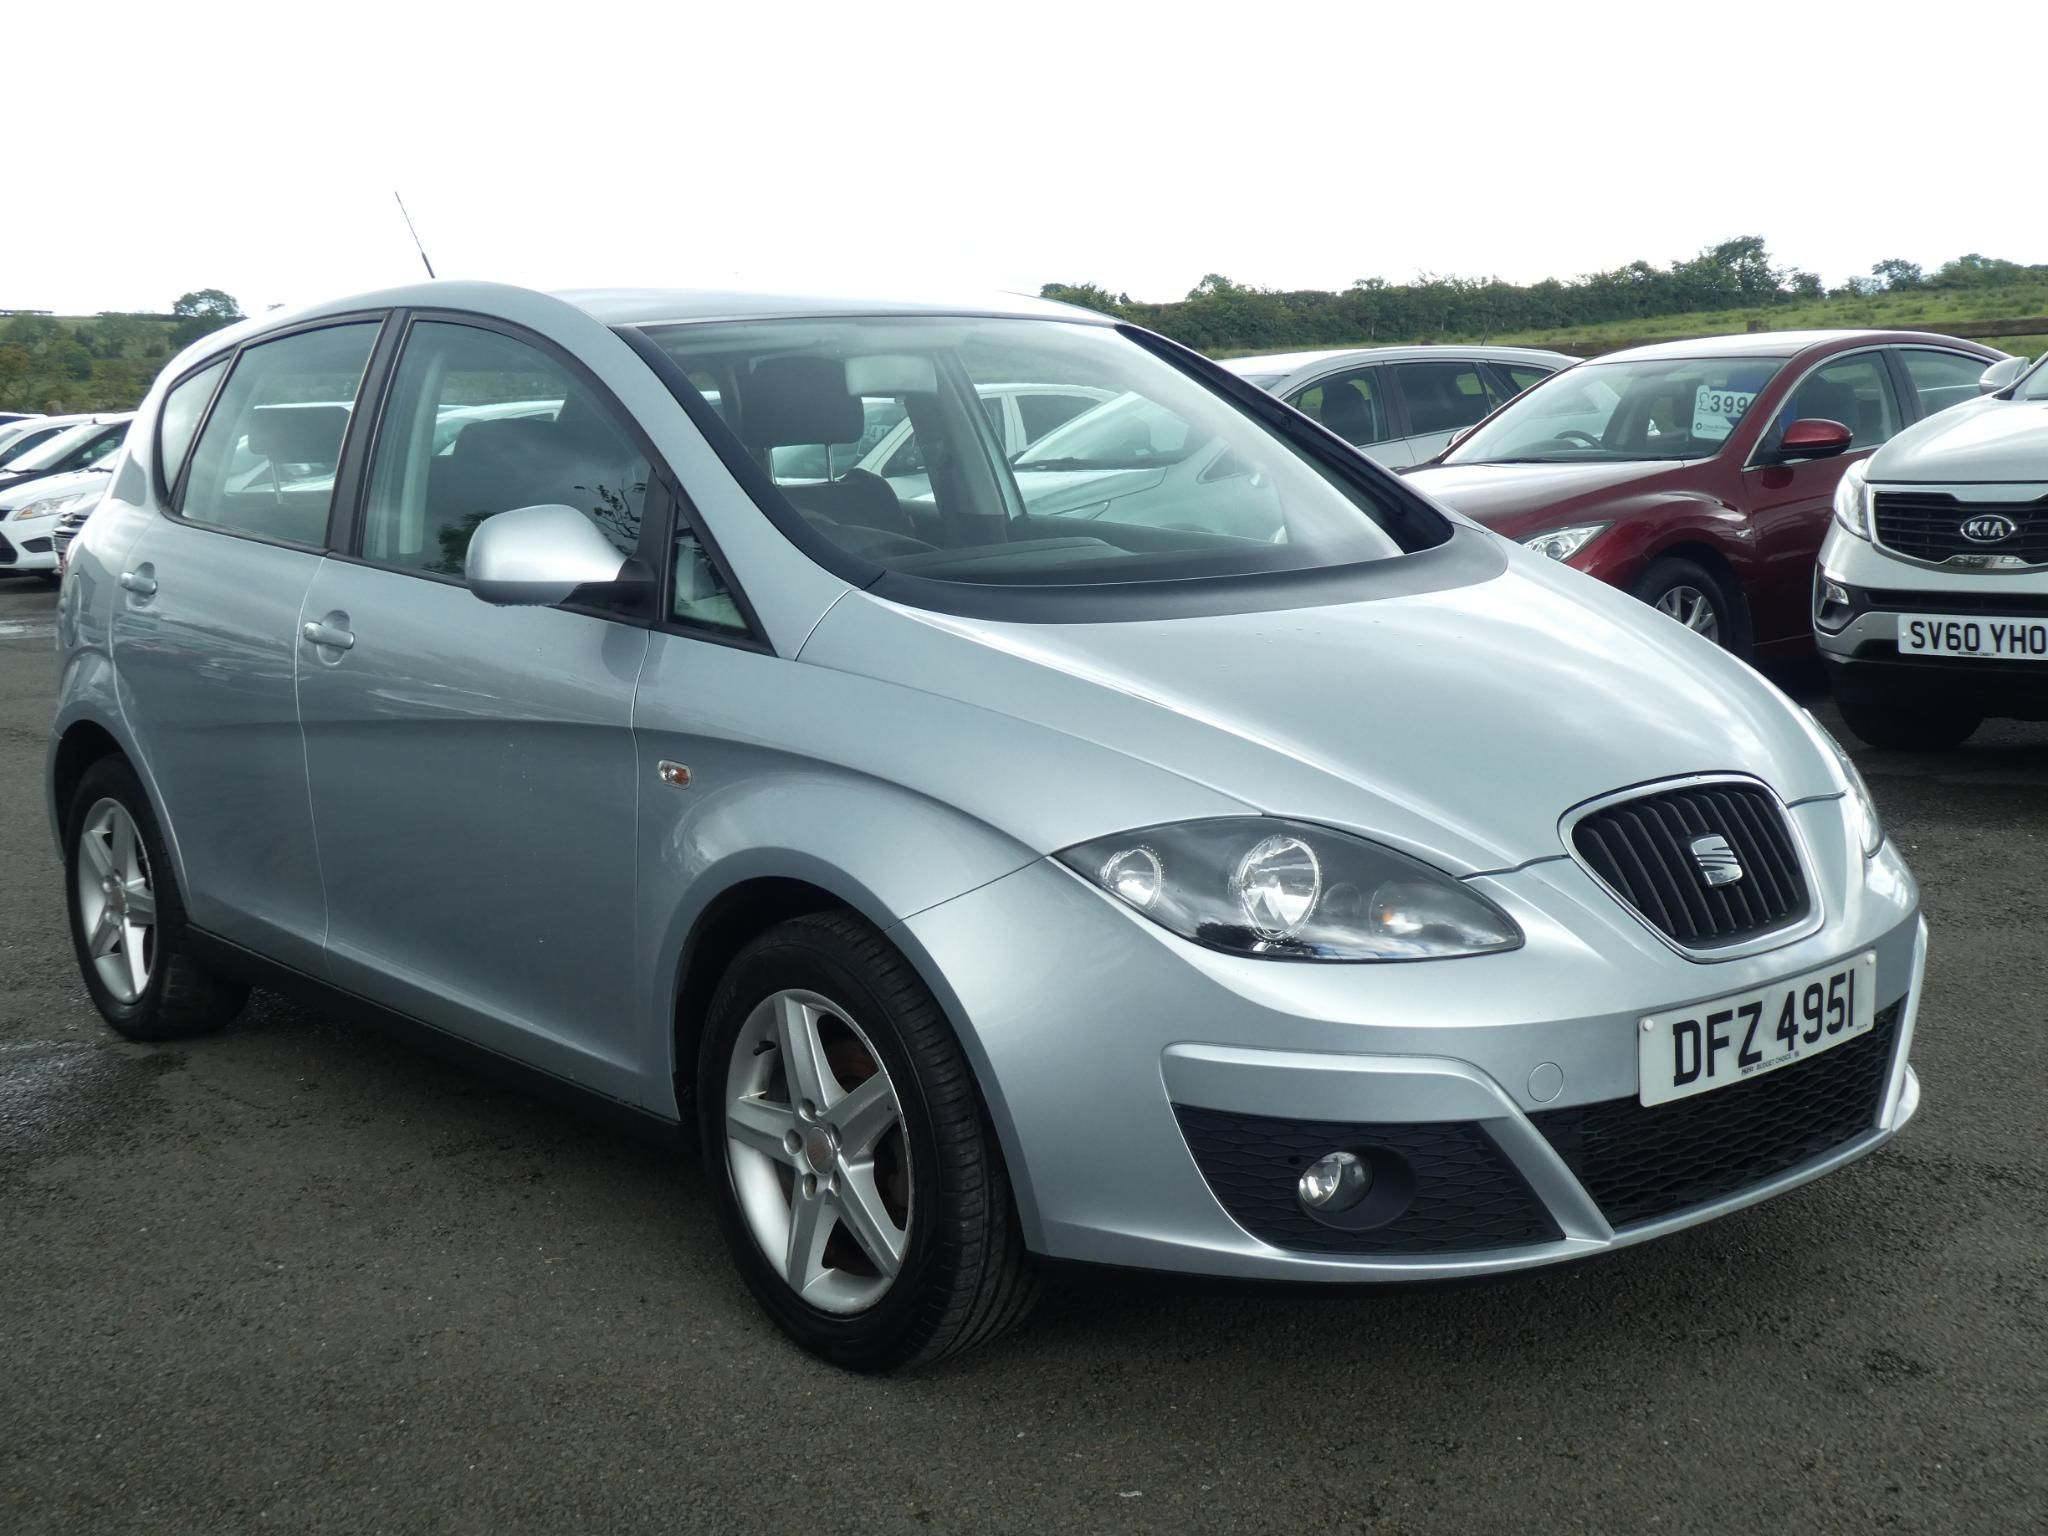 2010 SEAT Altea 1.6 S Emocion Petrol Manual only 58000 miles – FC Motors 52 Carntall Rd, Newtownabbey BT36 5SD full